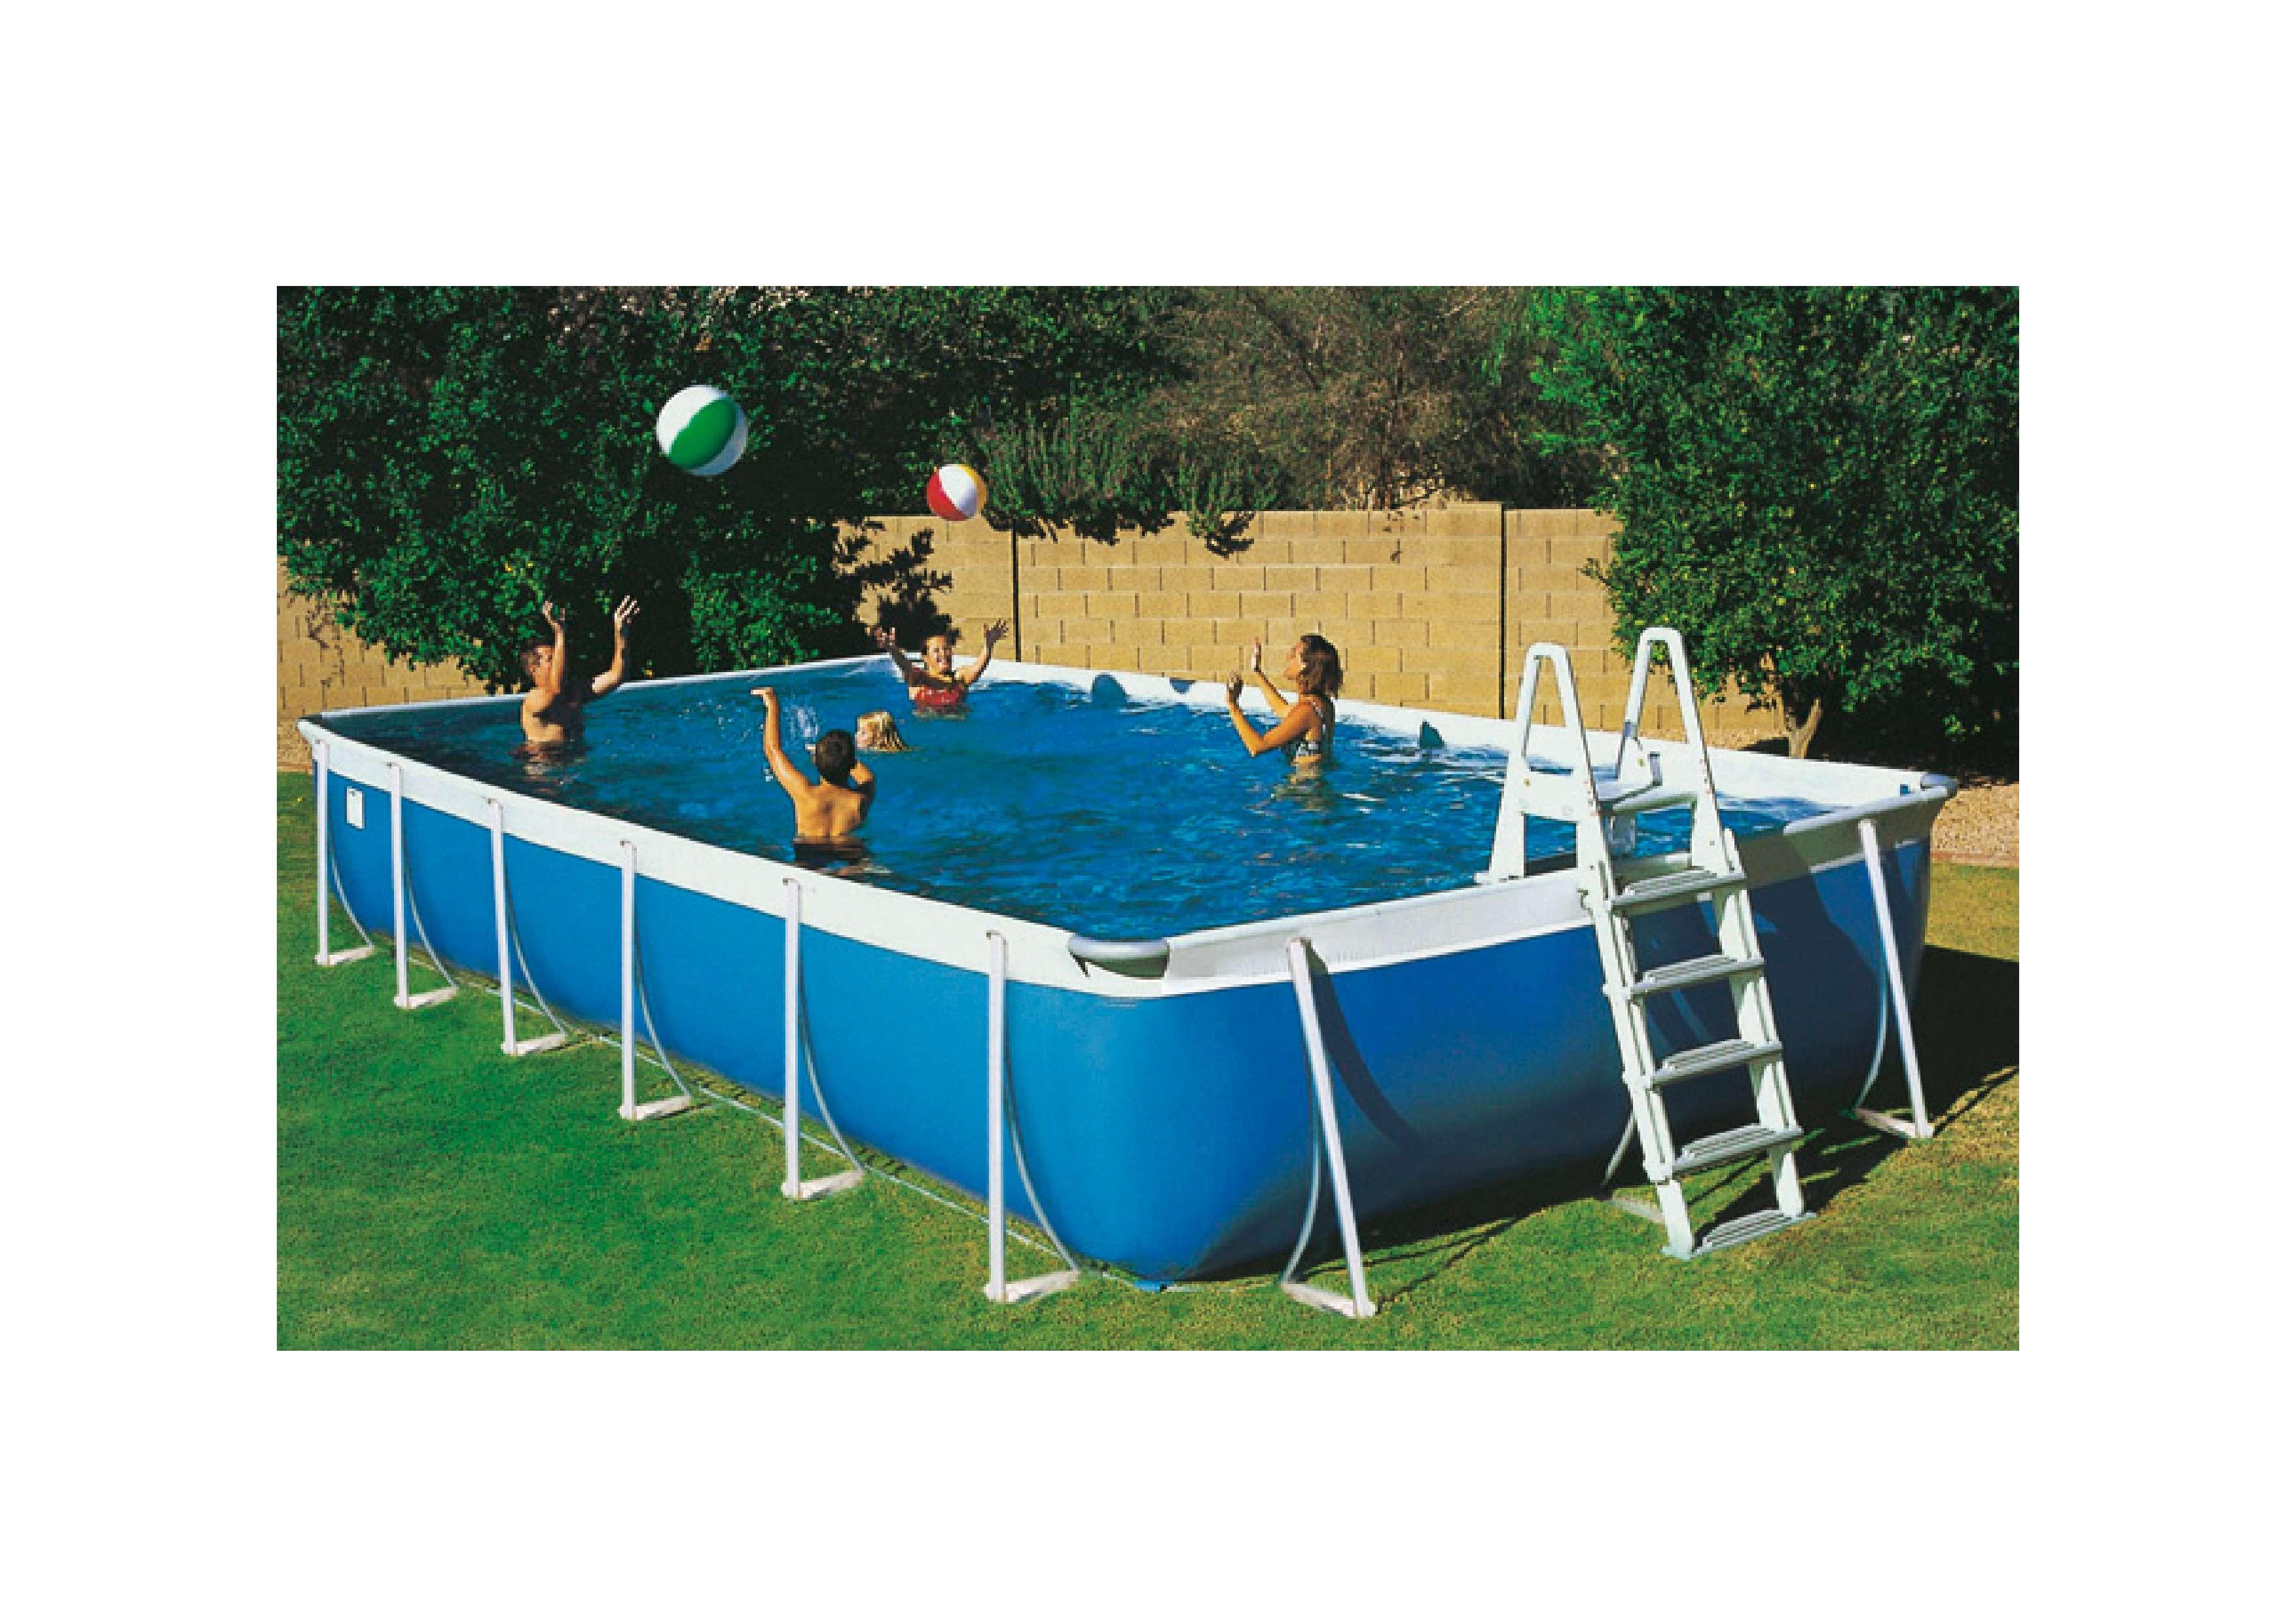 Milos piscina fuori terra autoportanti 1000 piscine - Piscine fuori terra autoportanti ...